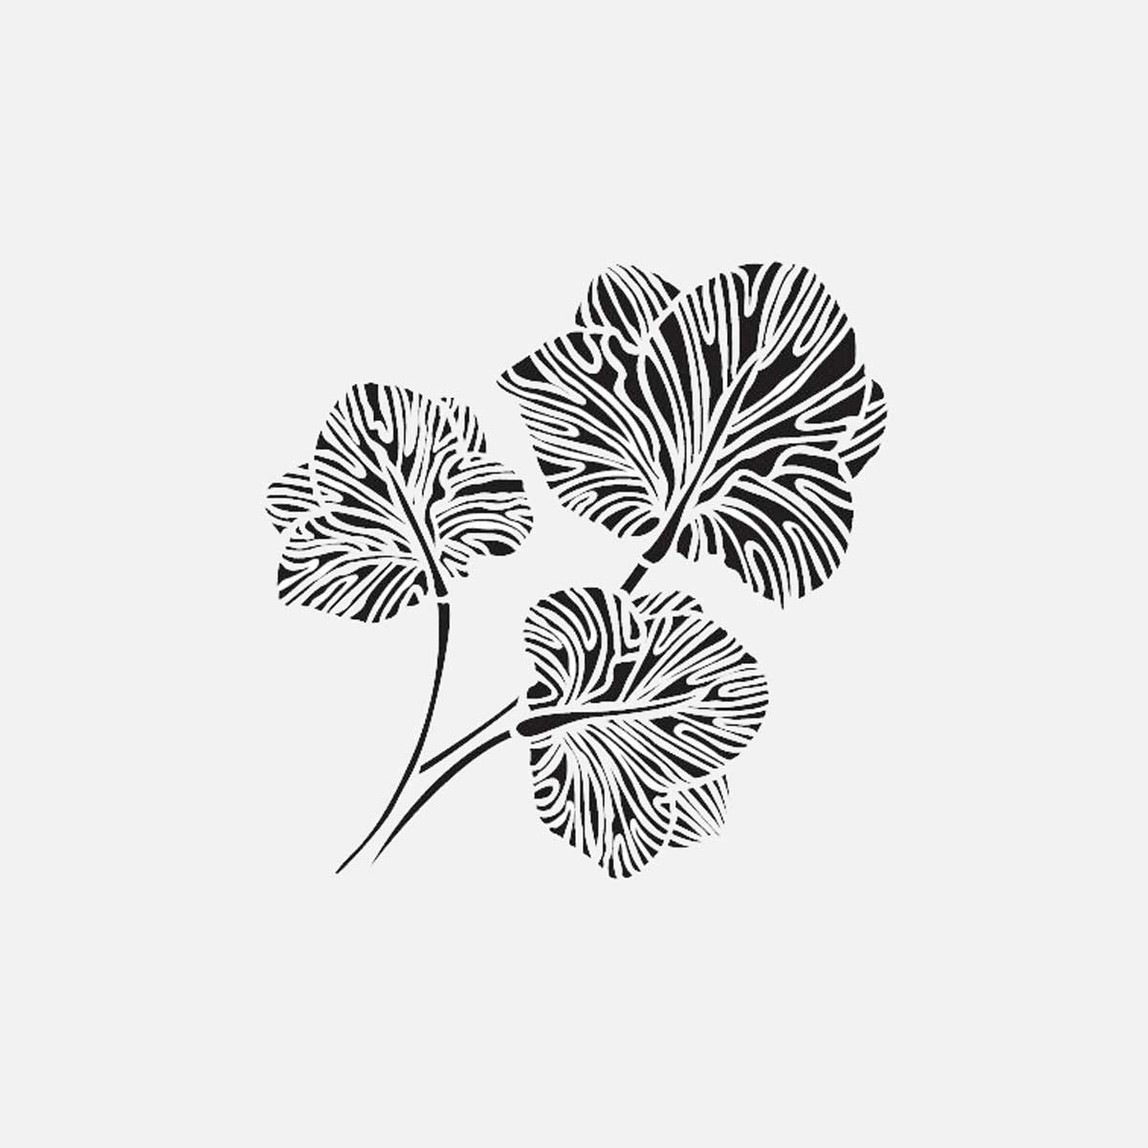 22X22Cm Zen Bahçeleri Happa Stencil